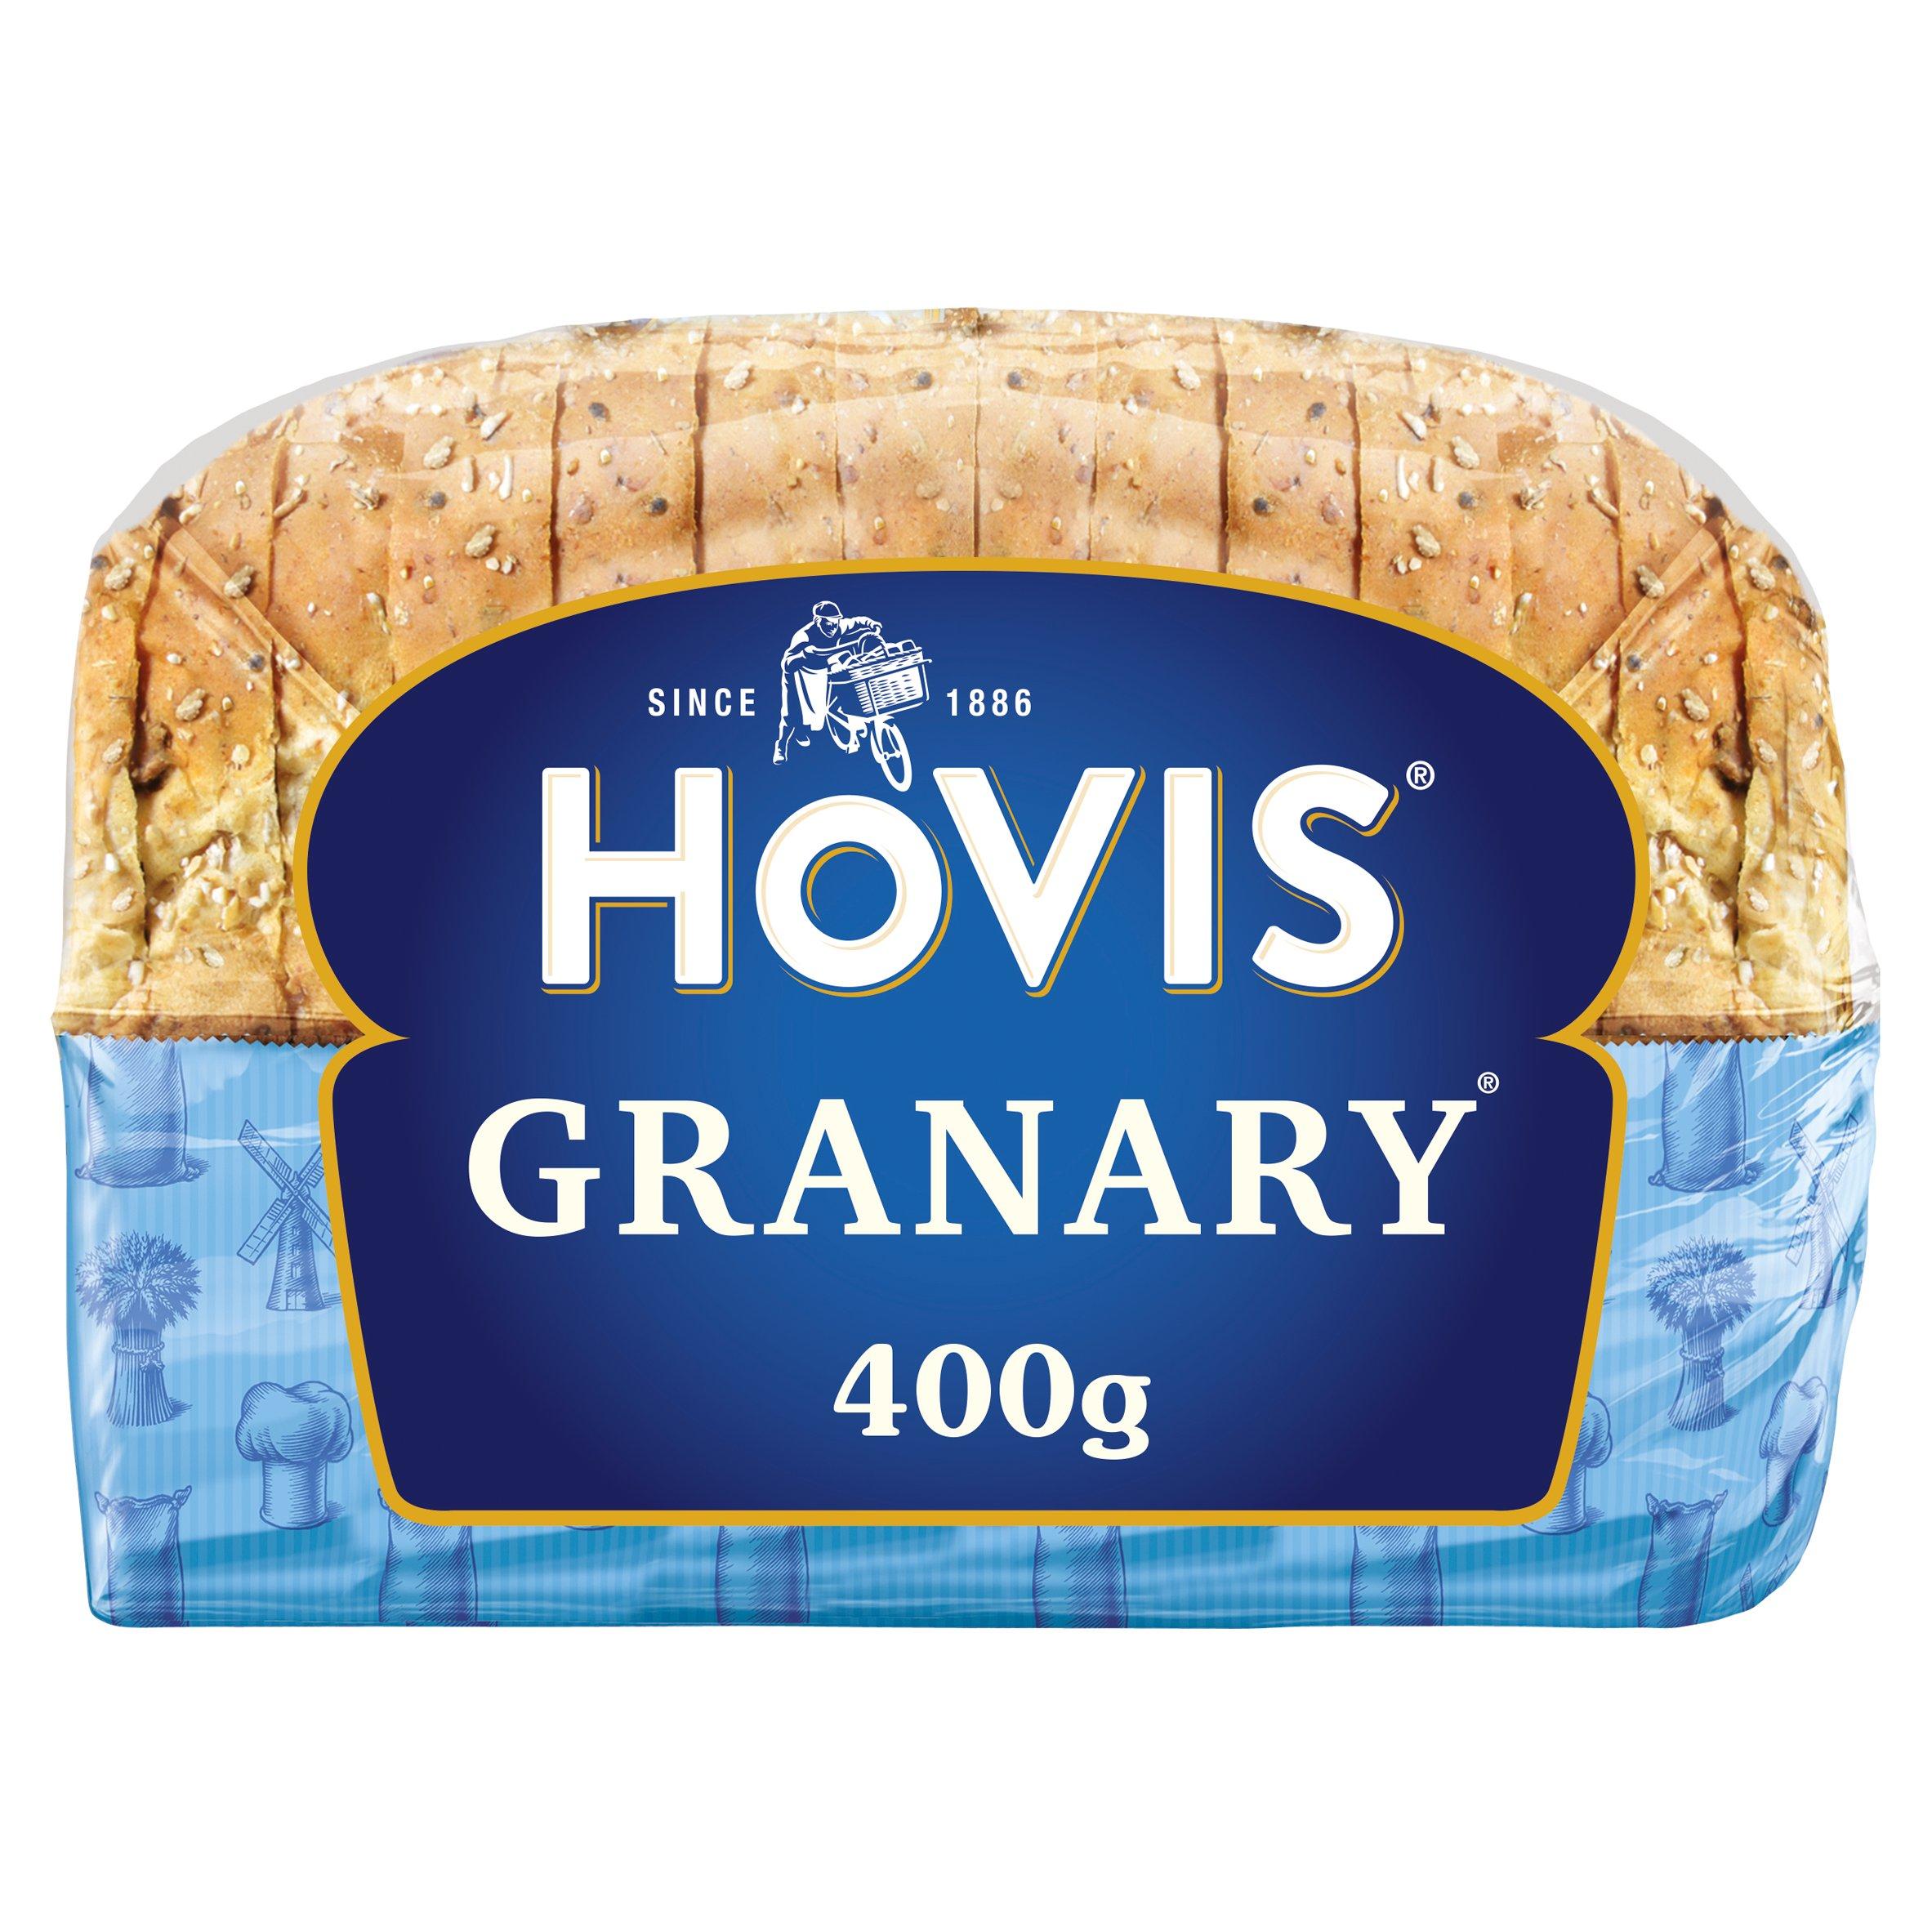 Hovis Original Granary Bread 400G